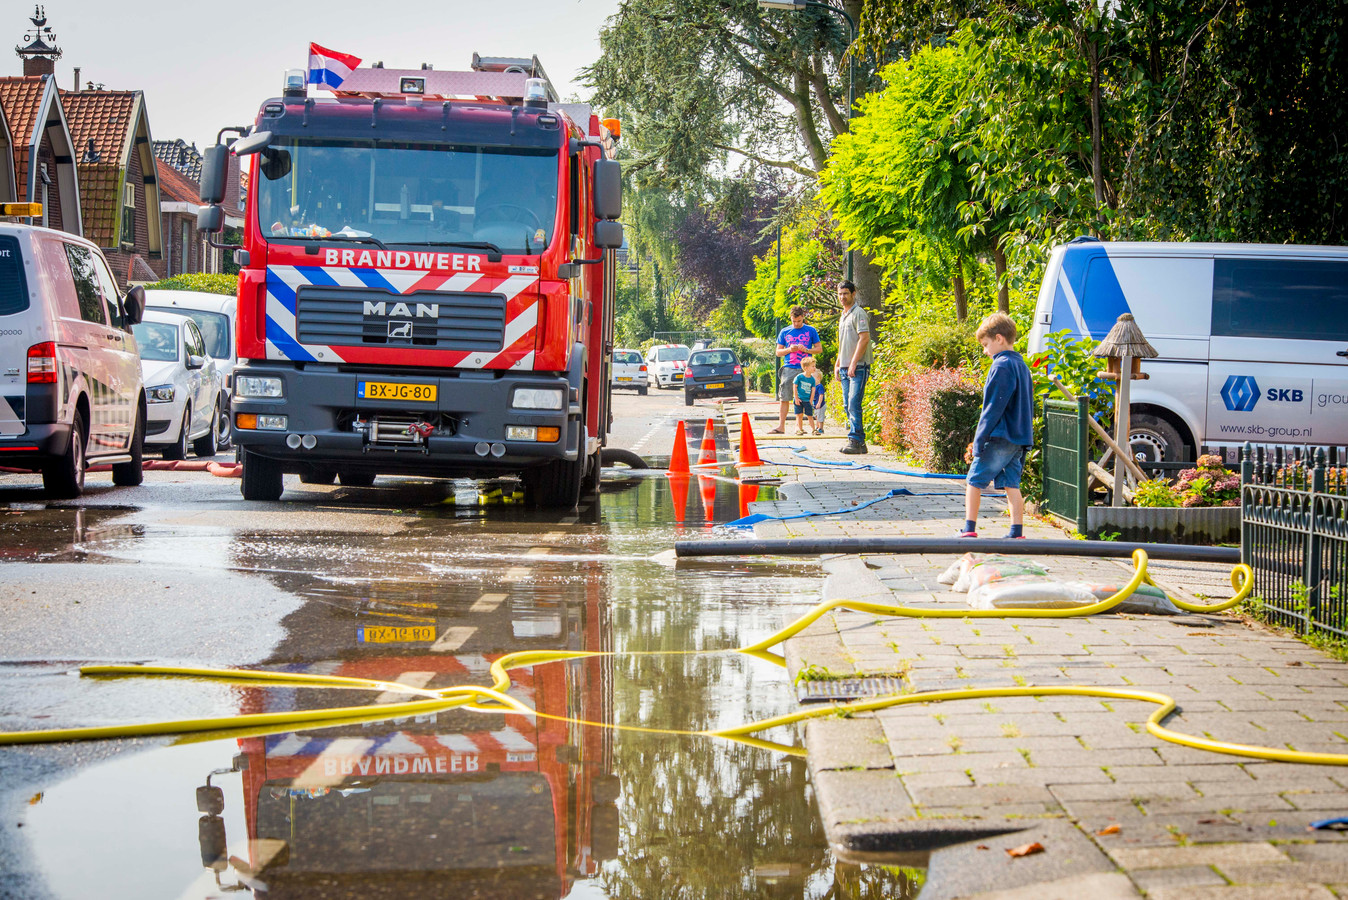 Wateroverlast in Hardinxveld-Giessendam in 2015.